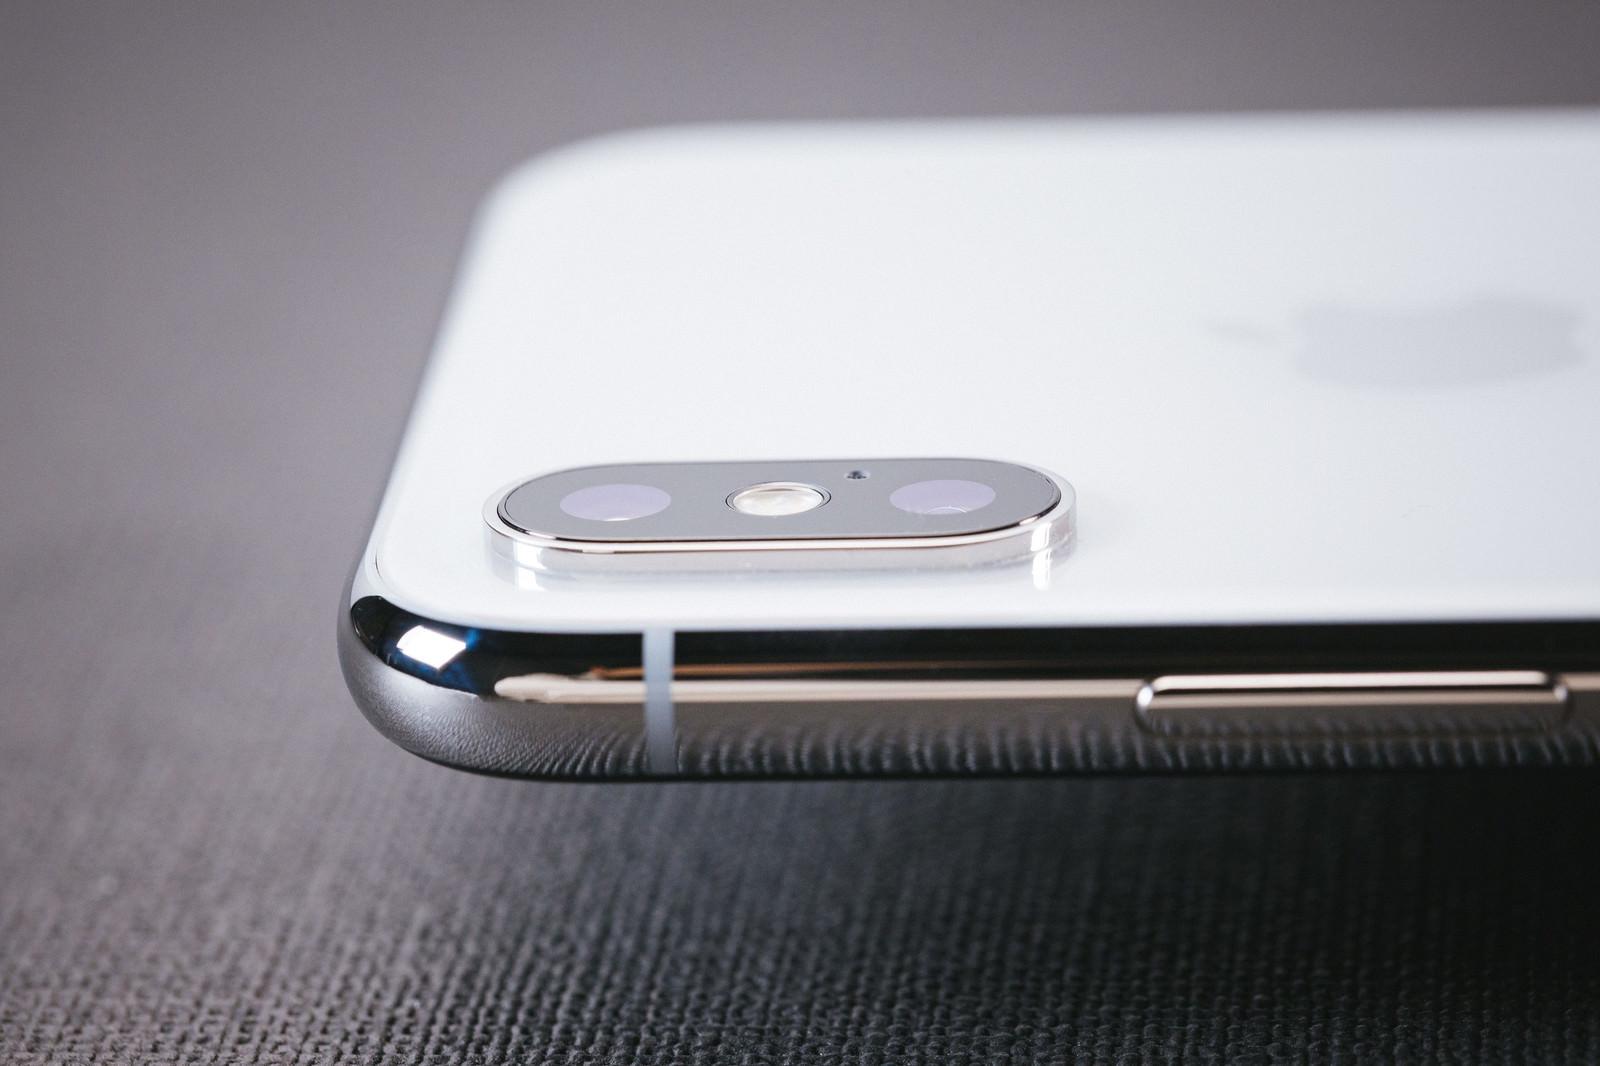 「iPhone X のデュアルレンズの出っ張り具合iPhone X のデュアルレンズの出っ張り具合」のフリー写真素材を拡大